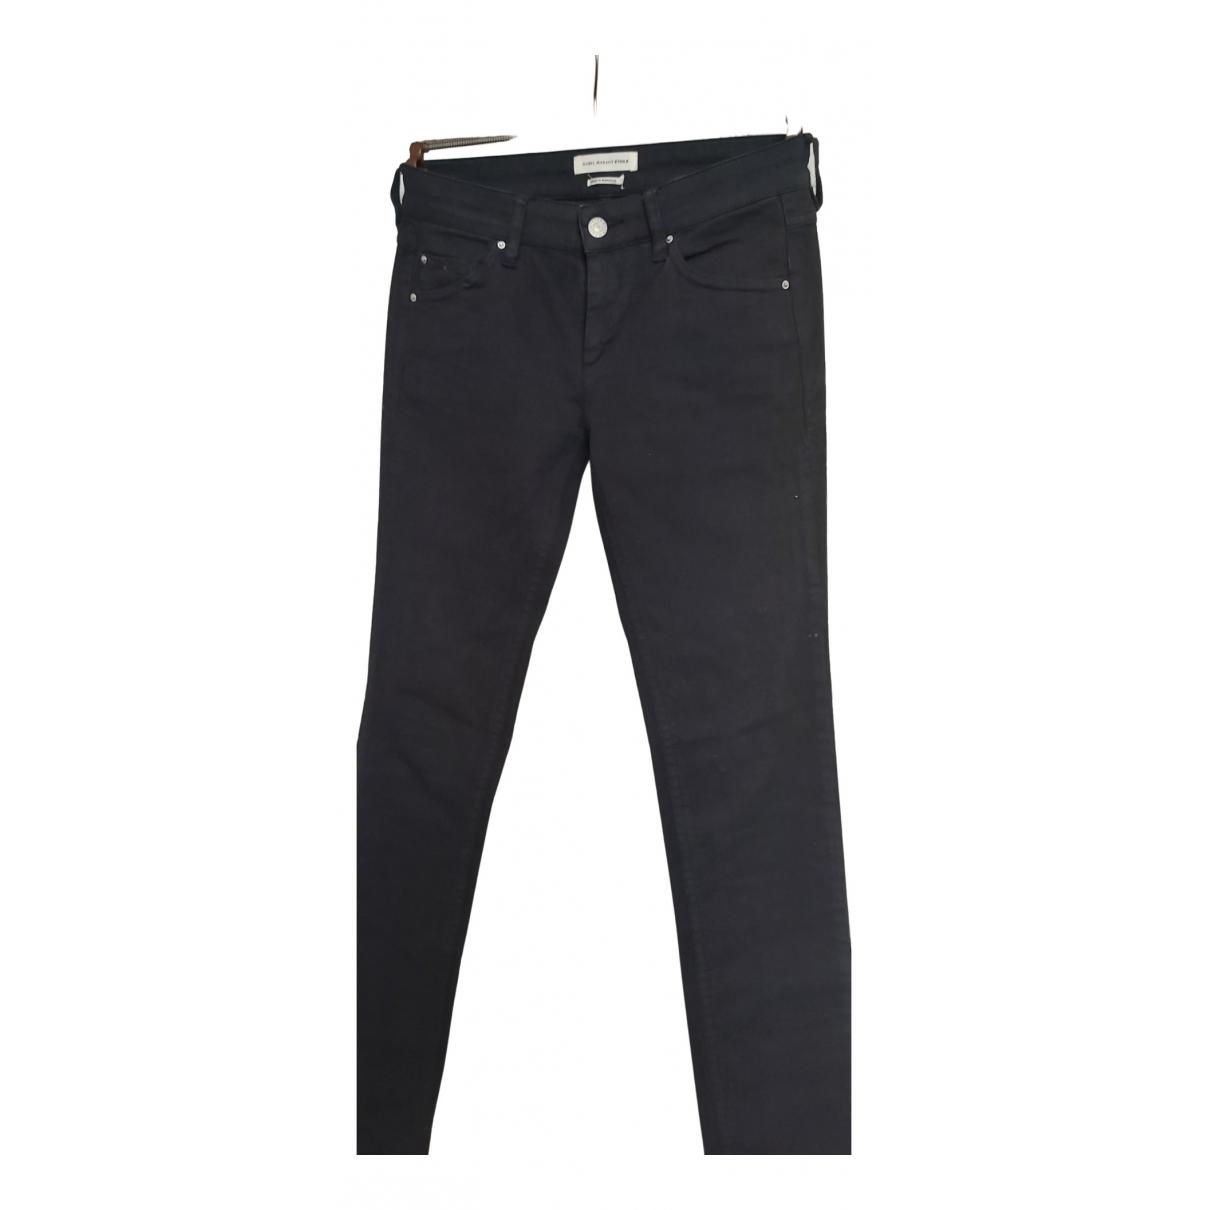 Isabel Marant Etoile \N Black Cotton Trousers for Women 36 FR